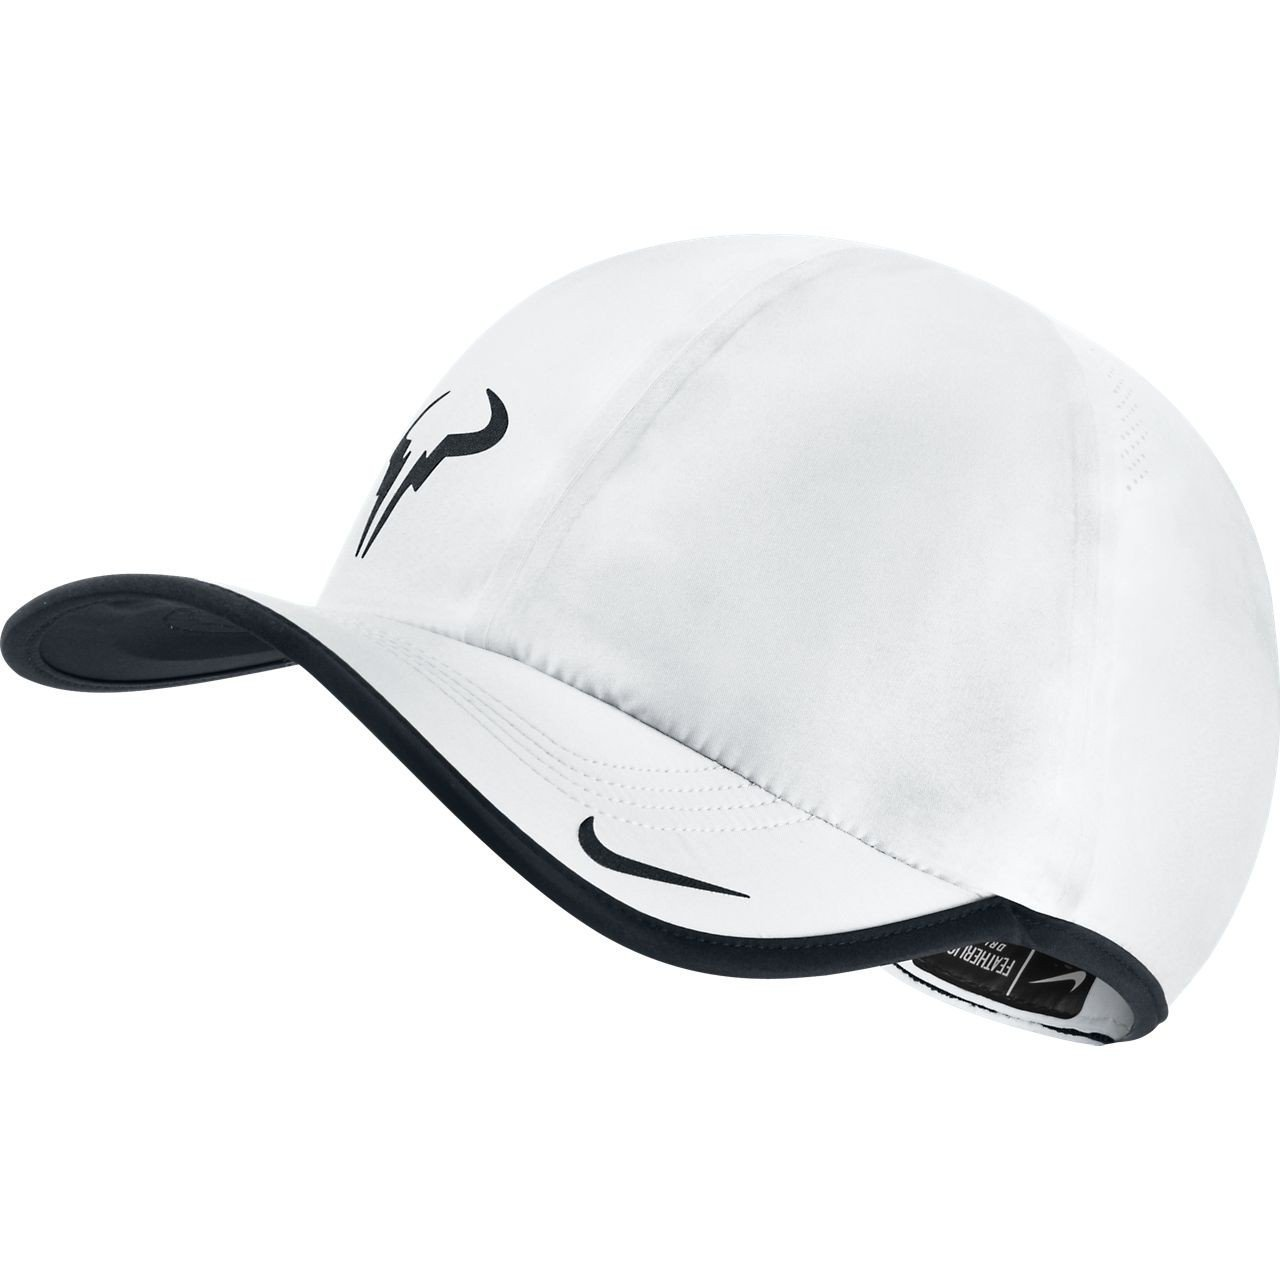 Get Quotations · Mens Nike Rafa Bull Featherlite Adjustable Tennis Hat  White Black 613966-100 8c3fc5521076